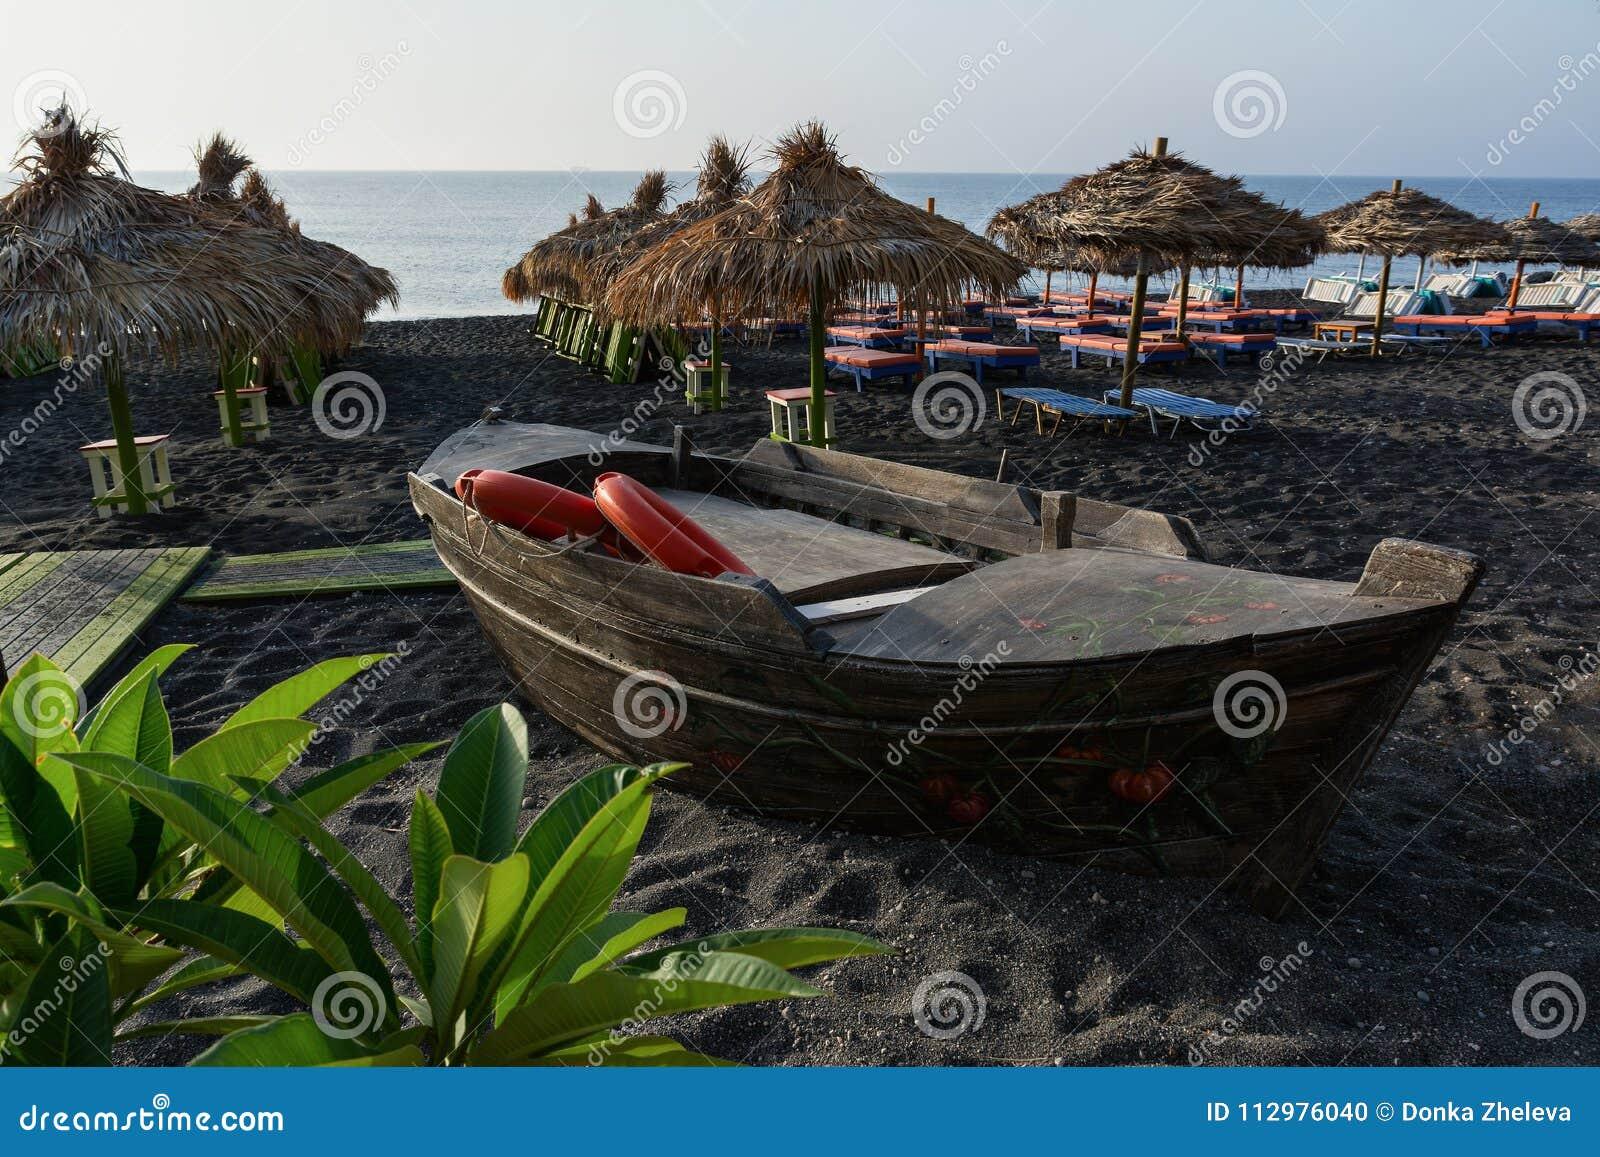 Wooden boat, tanning beds and straw umbrellas on Perissa beach, Santorini island, Greece